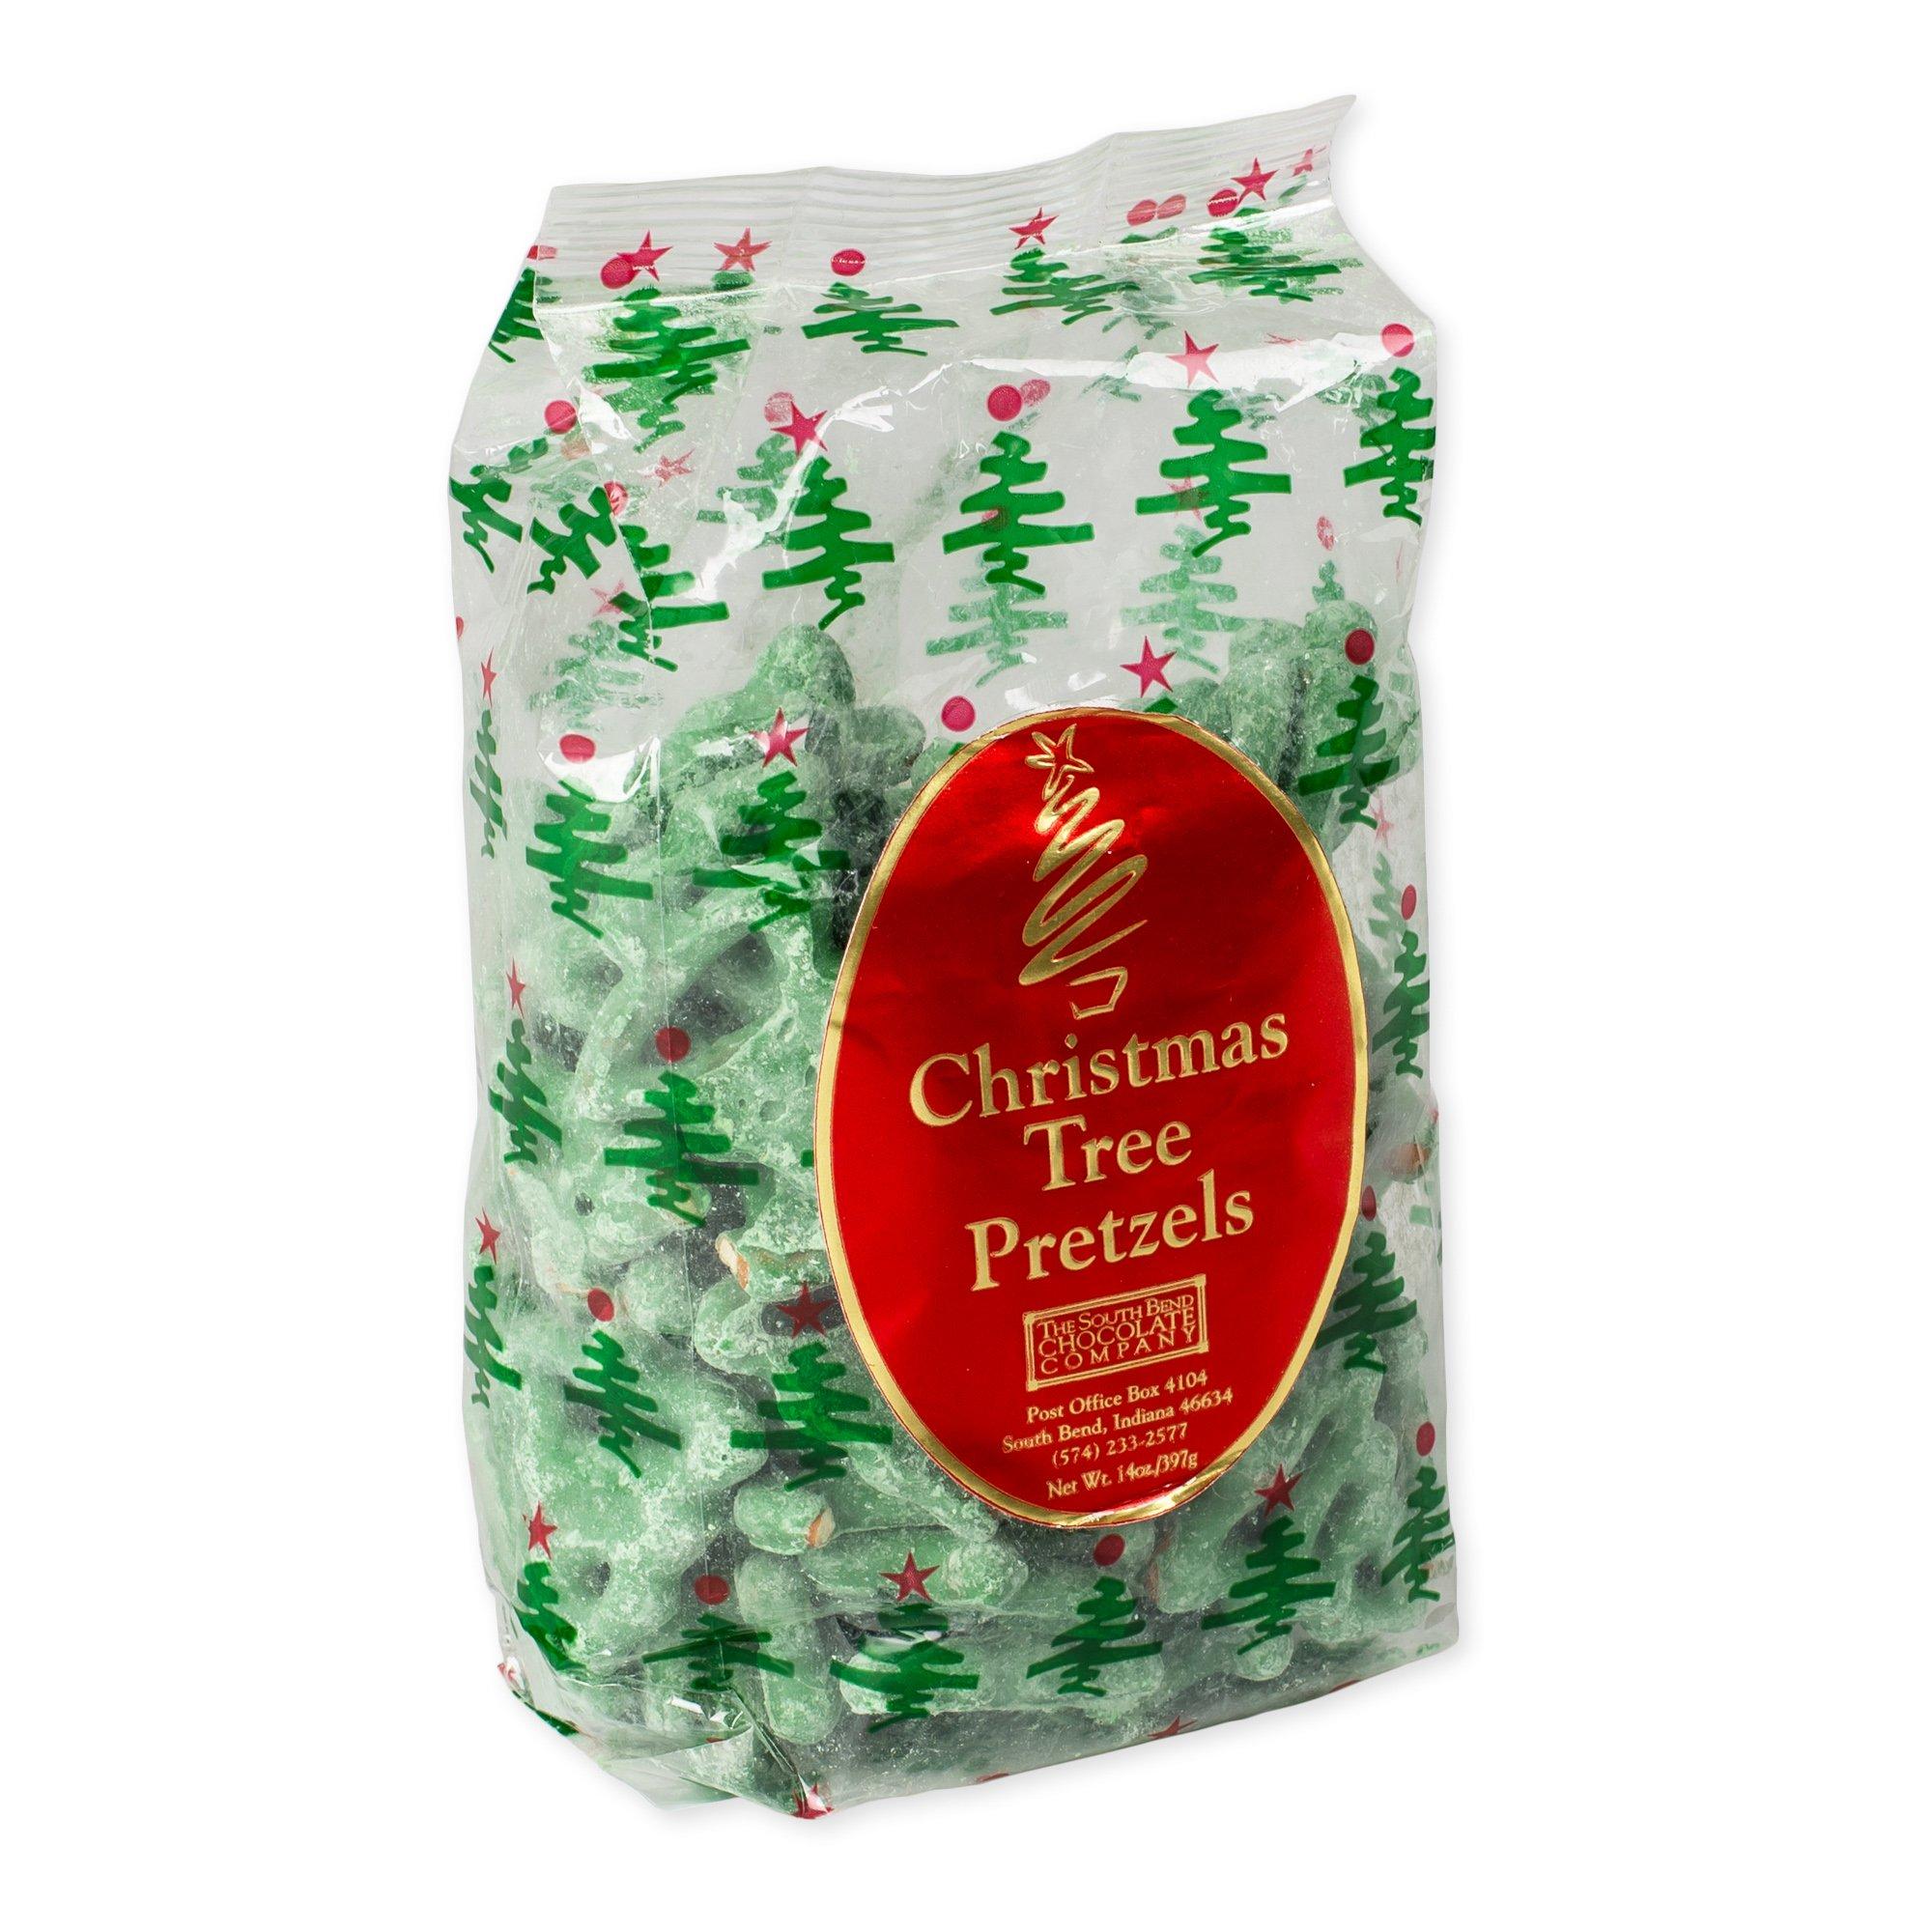 14 Oz Christmas Tree Mint Pretzels by South Bend Chocolate Company by The South Bend Chocolate Company